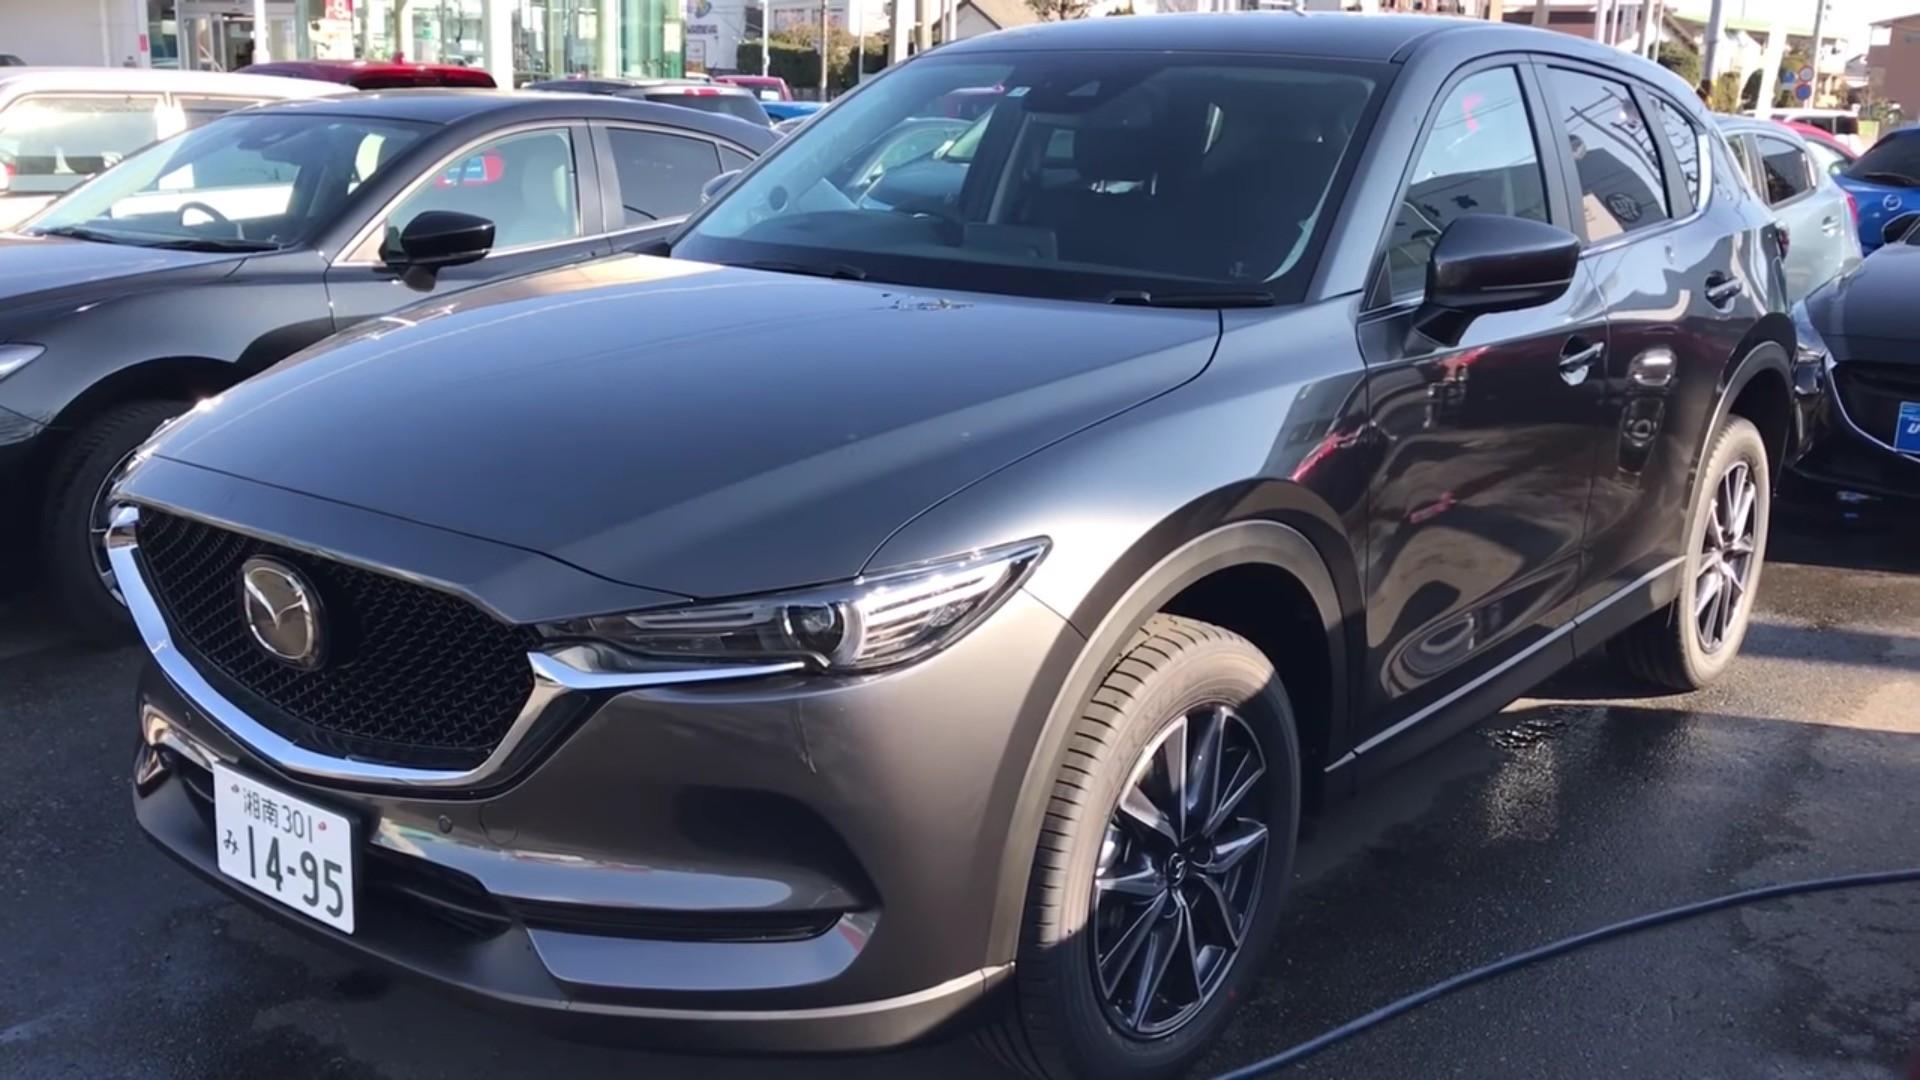 Mazda 3 2017 Custom >> 2017 Mazda CX-5 POV Test Drive Reveals How Quiet the 2.2-liter Diesel Engine Is - autoevolution